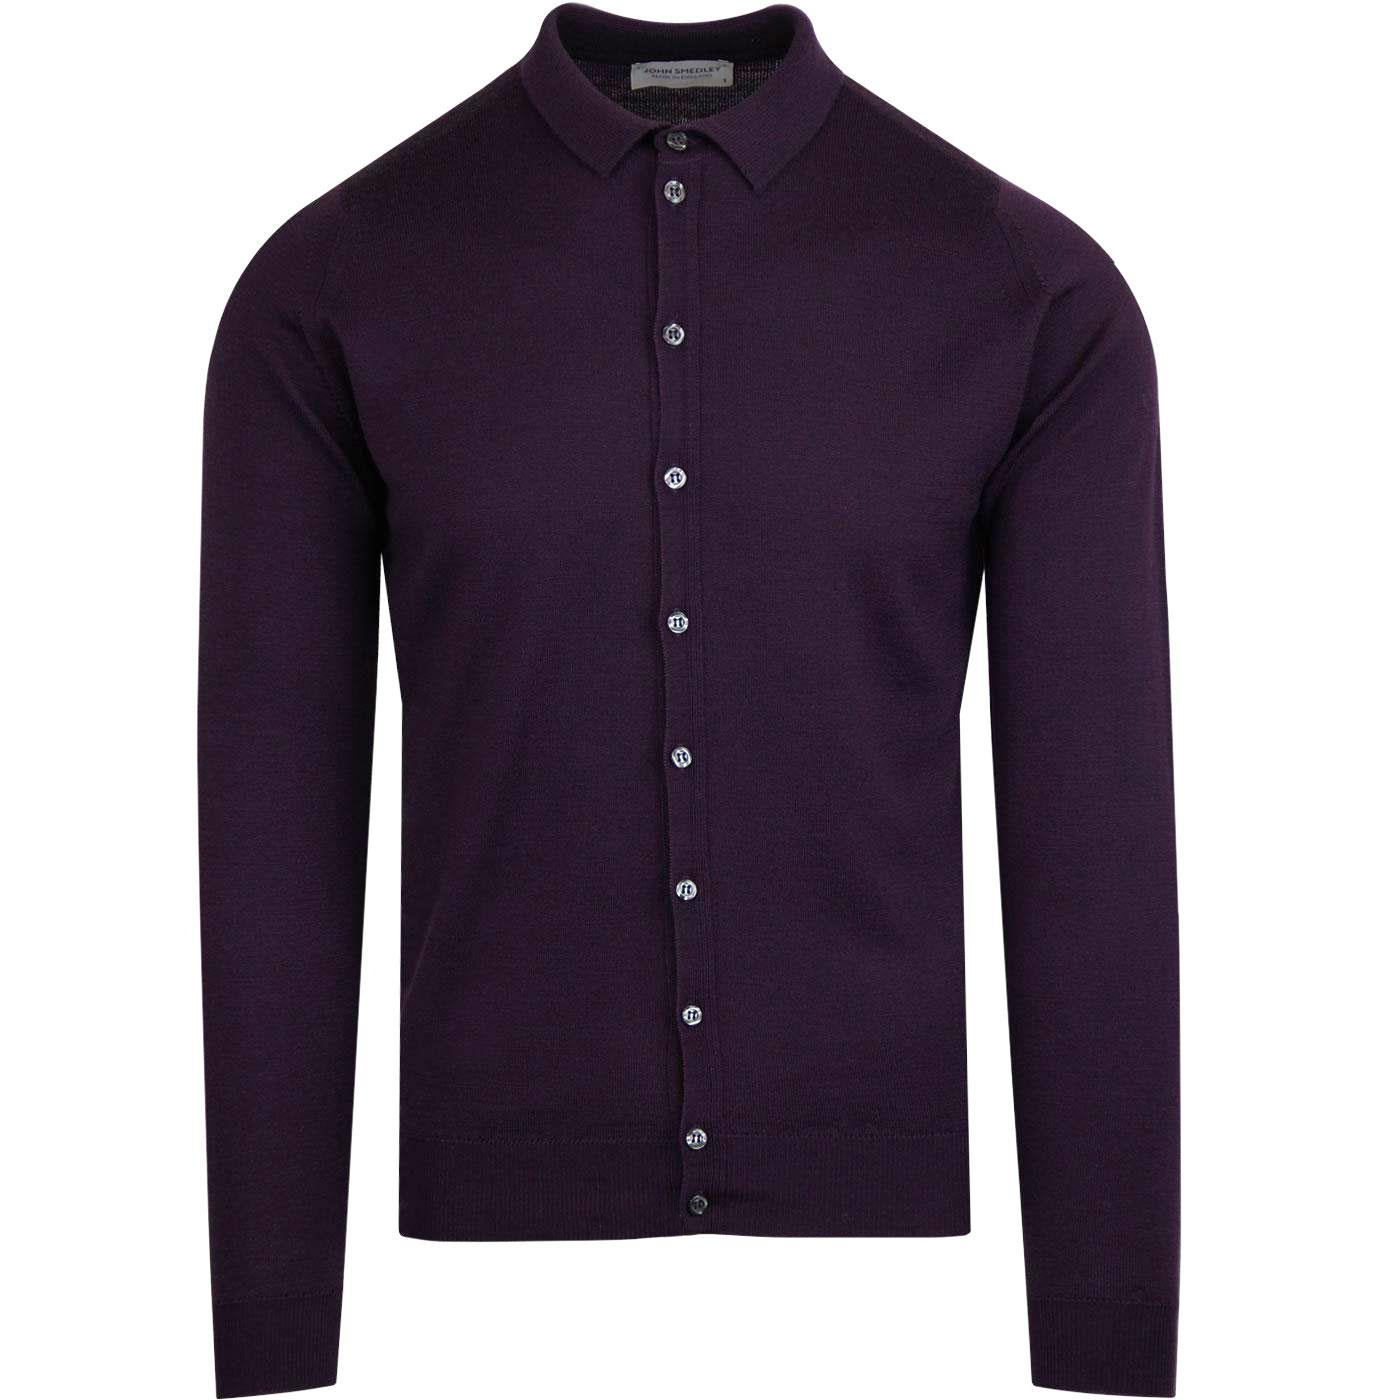 Parwish JOHN SMEDLEY Made in England Knit Shirt MP